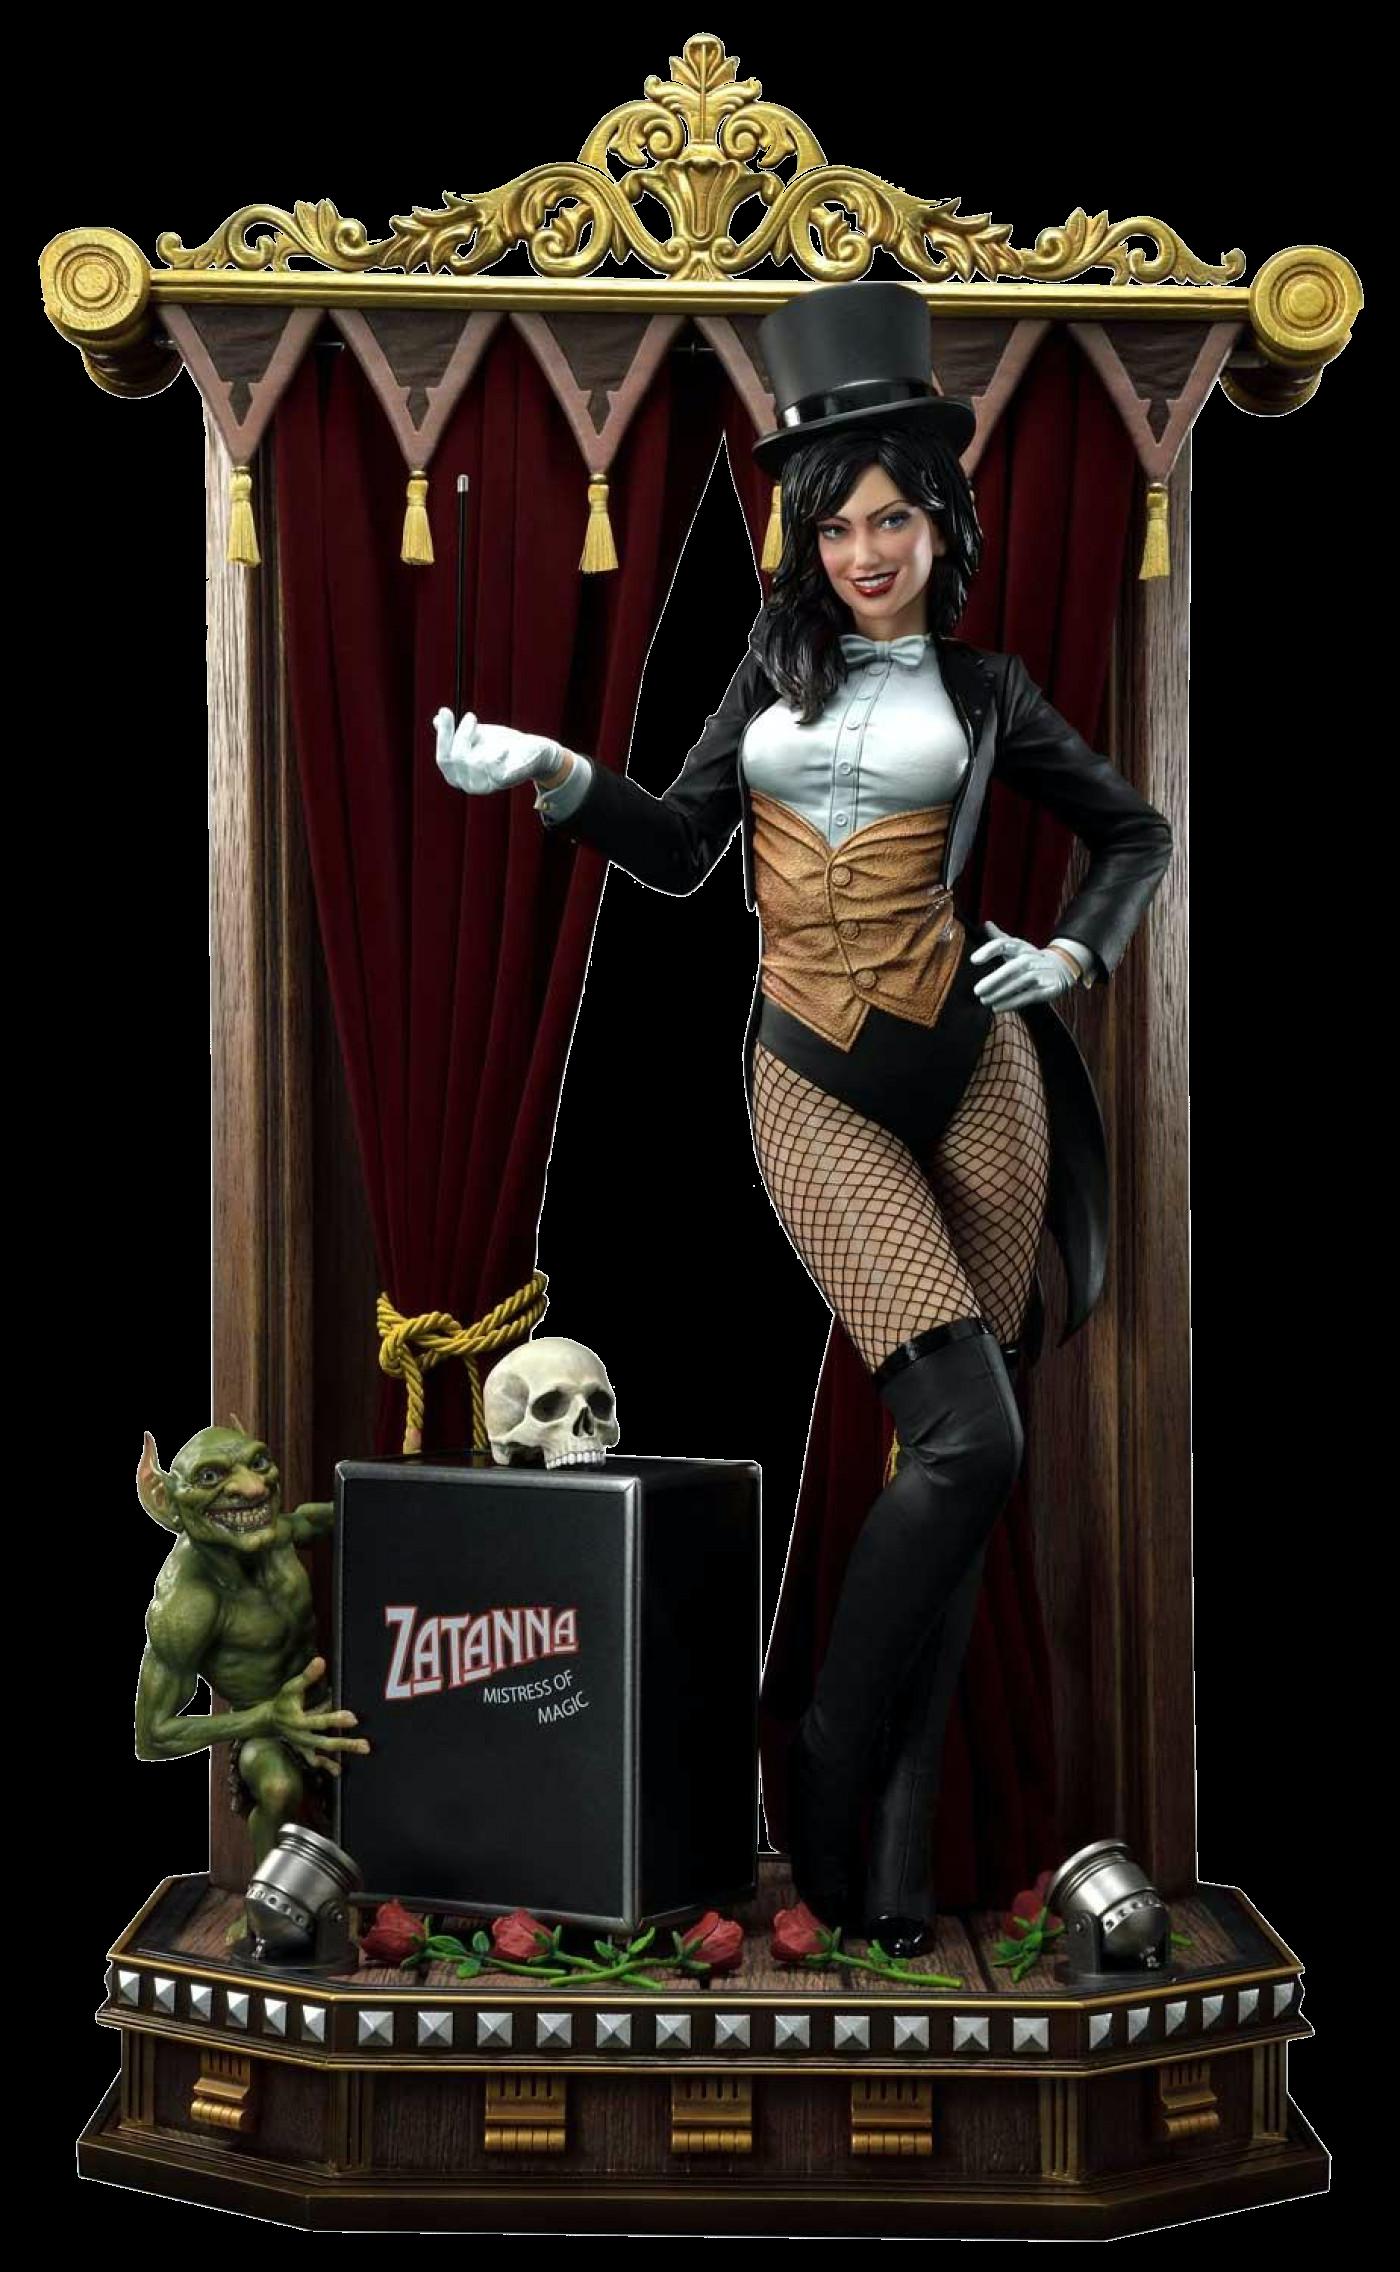 prime1-studio-dc-comics-zatanna-zatara-1:3-deluxe-statue-toyslife